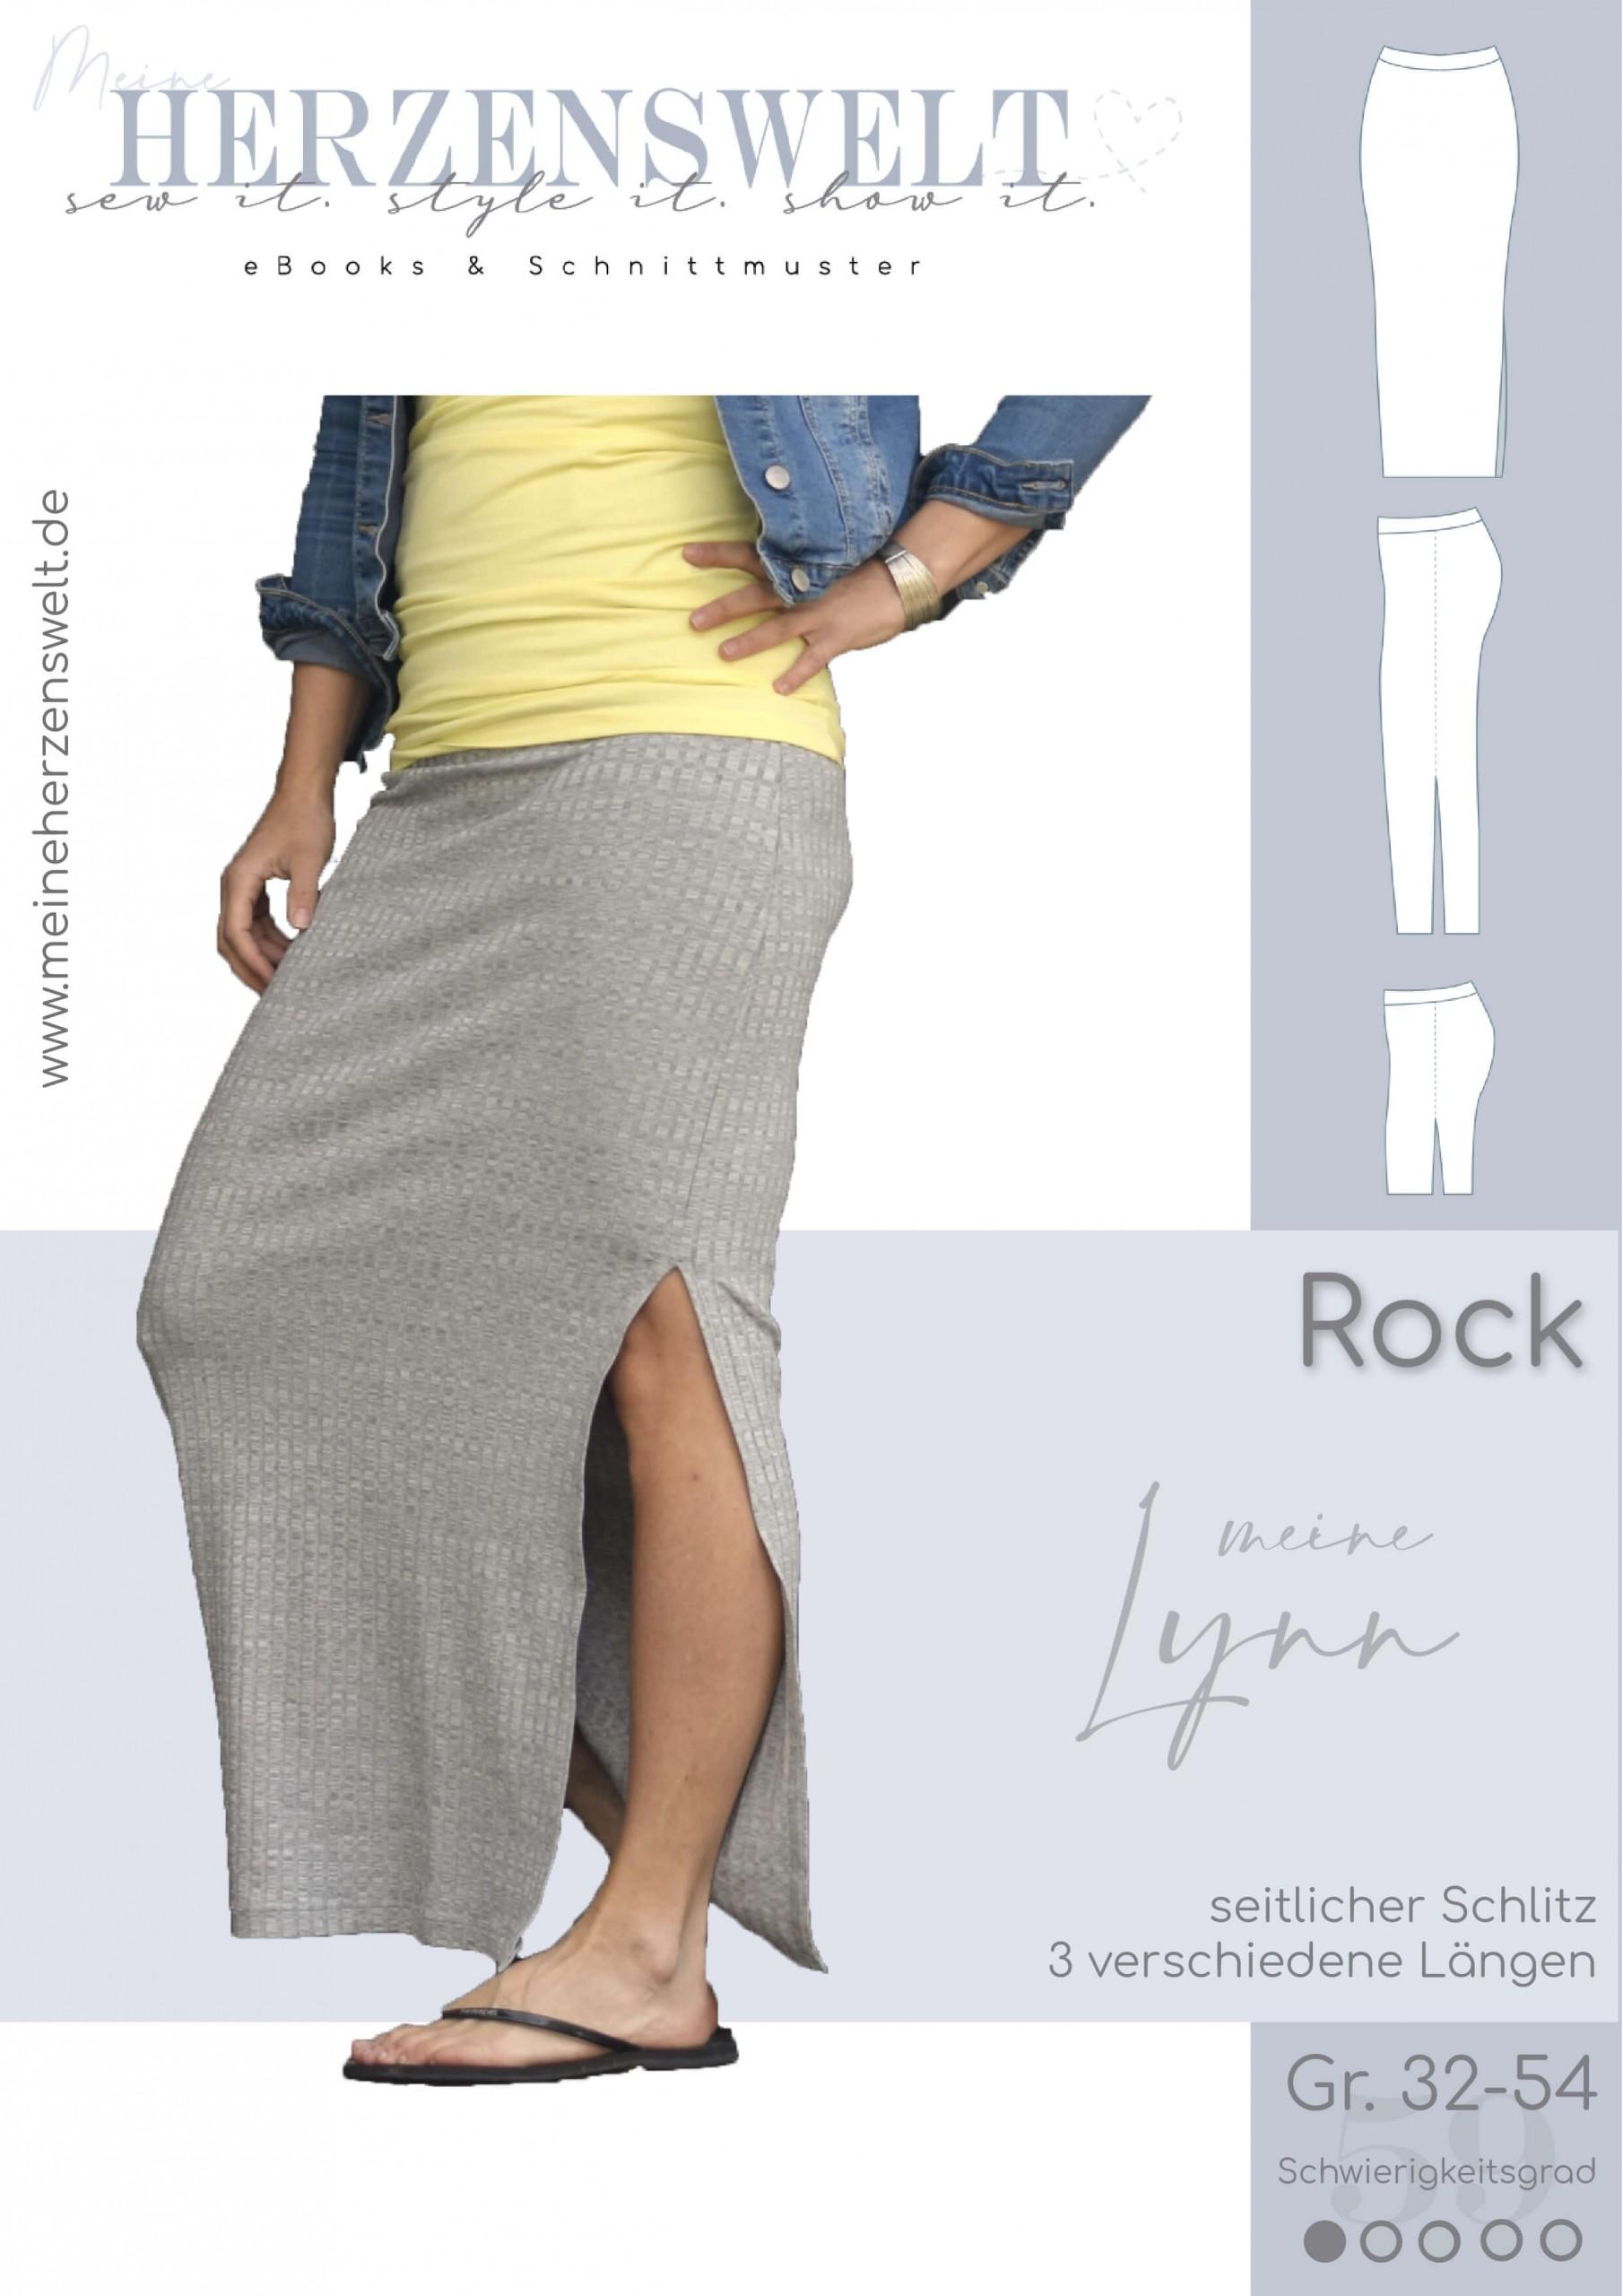 Rock Damen – Schnittmuster Gr. 32-54 – LYNN #59